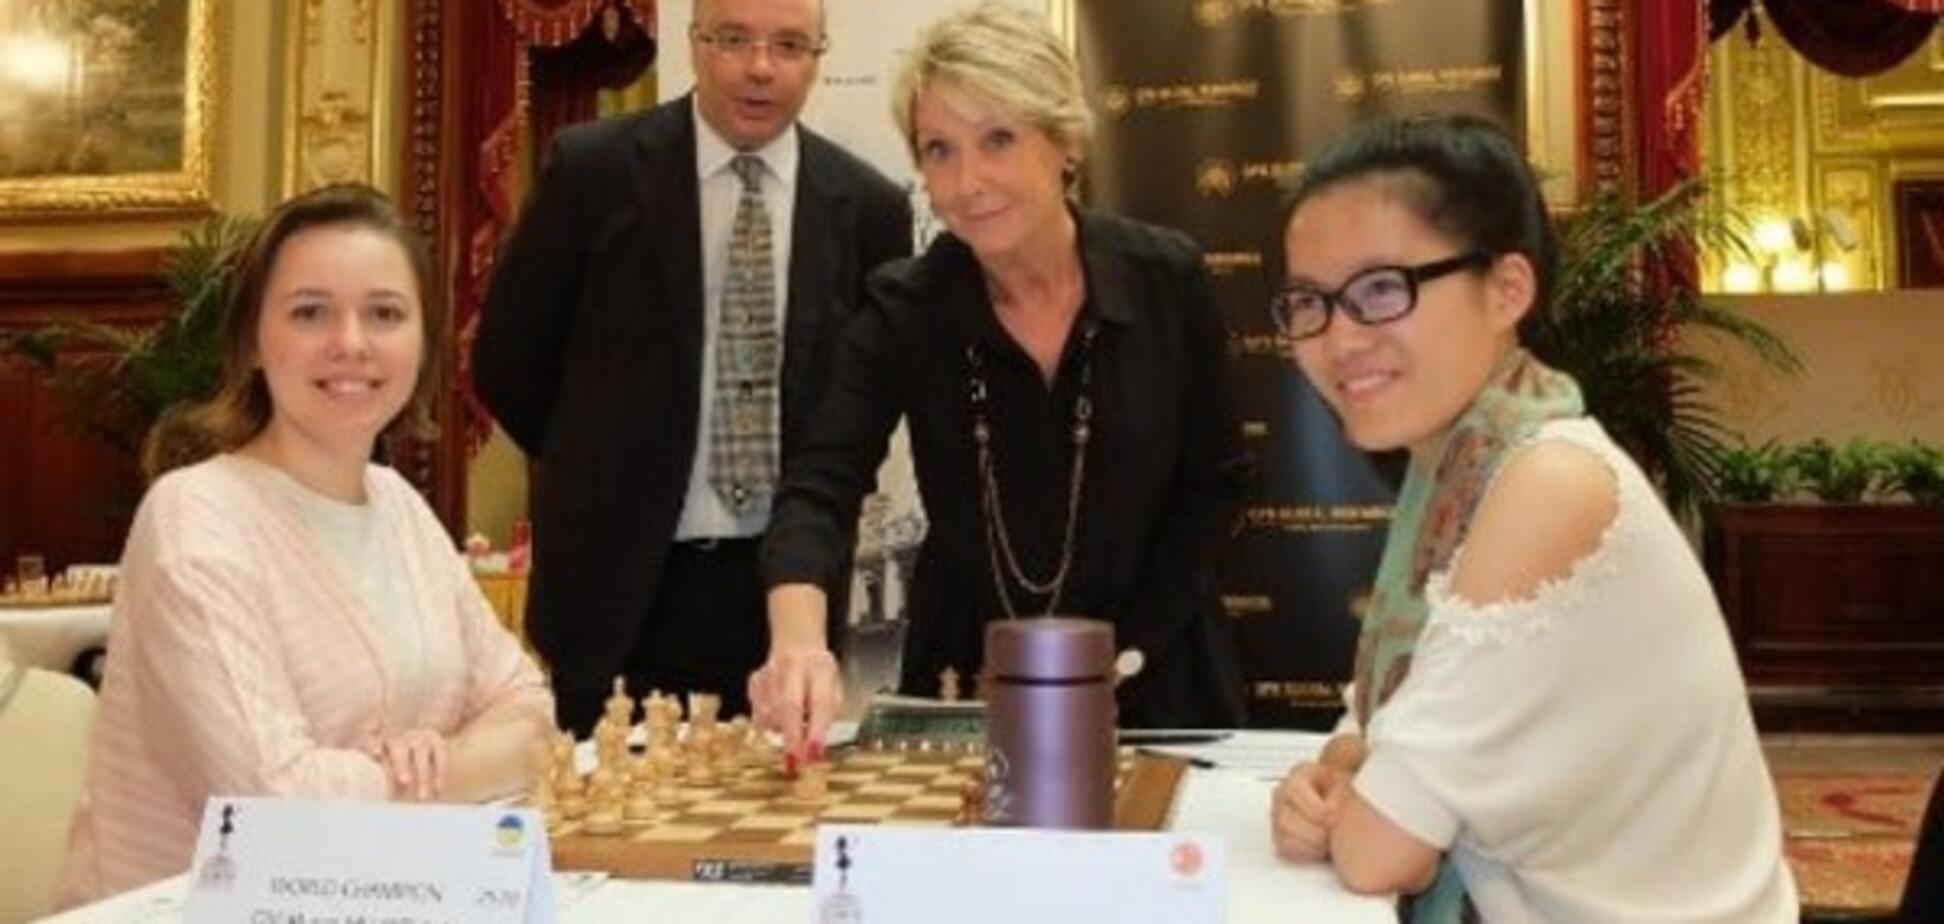 Музичук - Іфань: календар фіналу чемпіонату світу з шахів